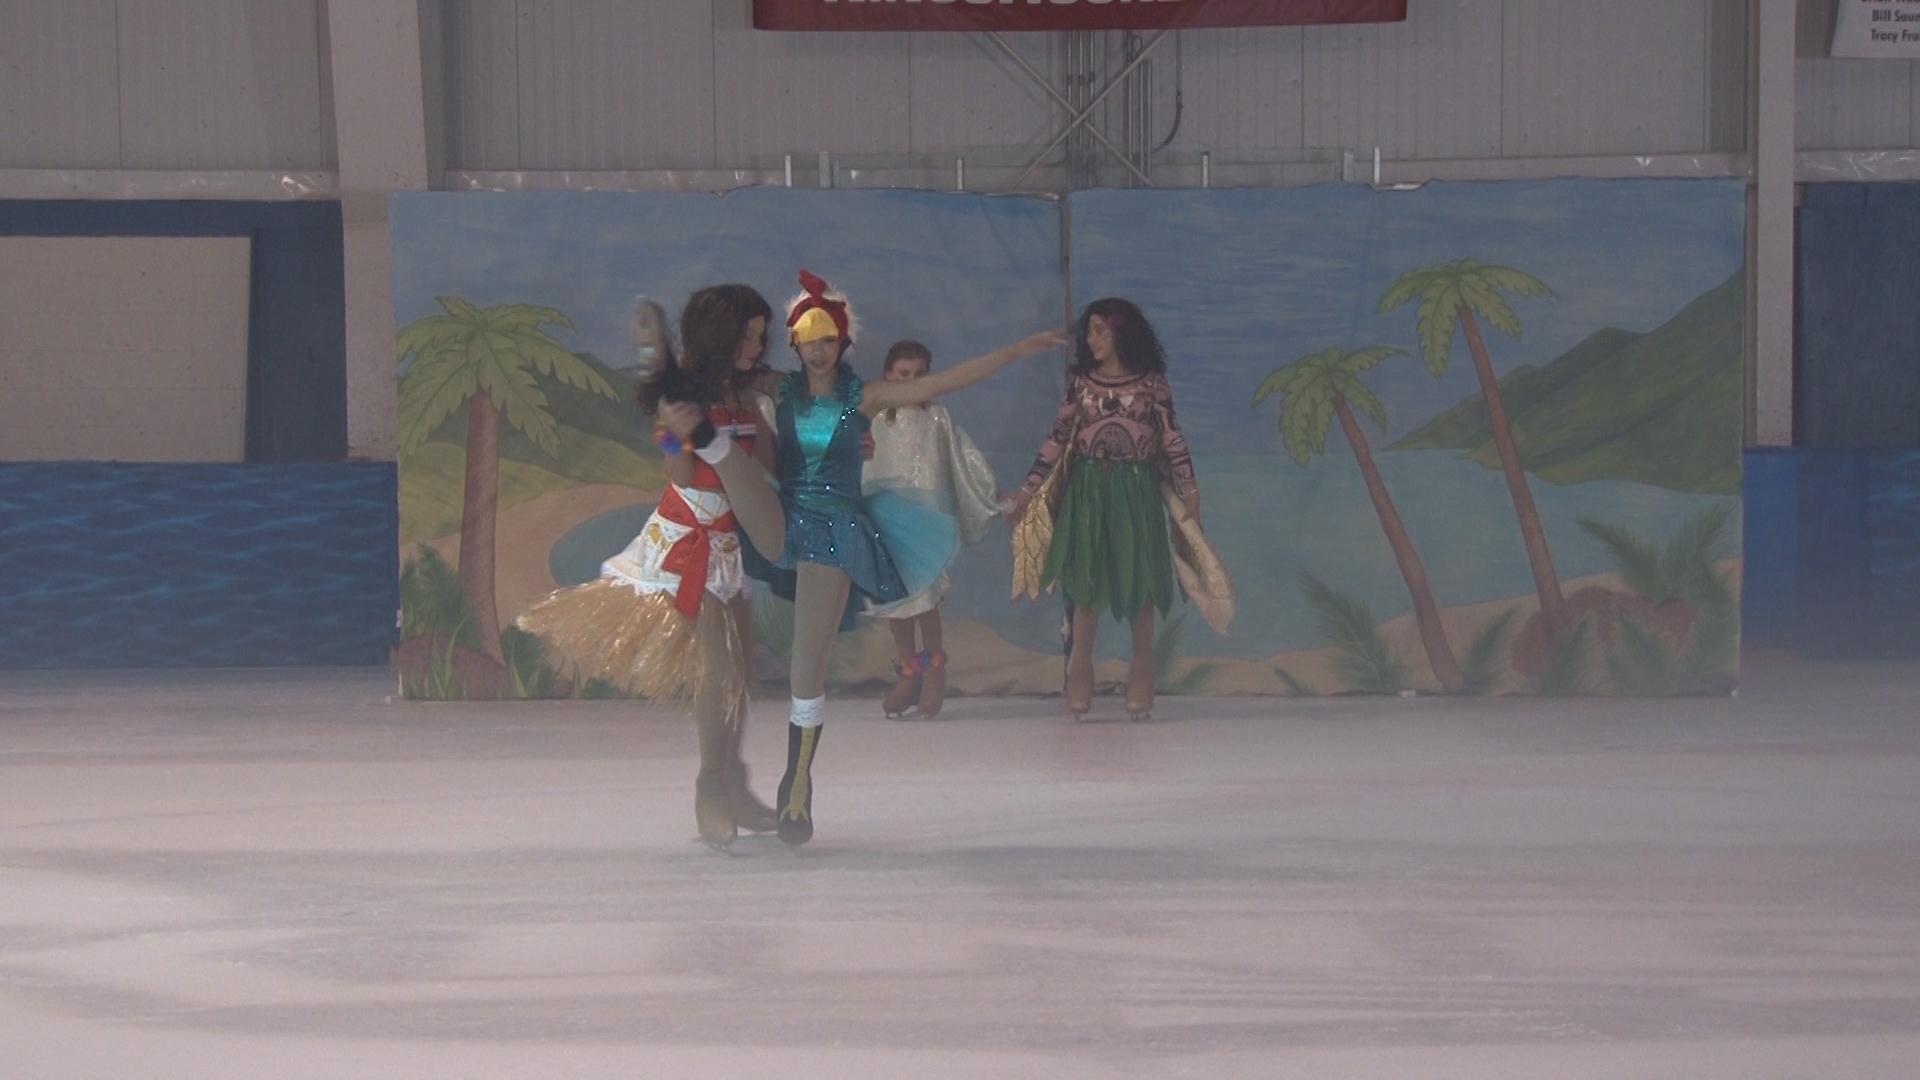 Power Play Maui Skate on Ice 071417.00_54_09_01.Still080.jpg